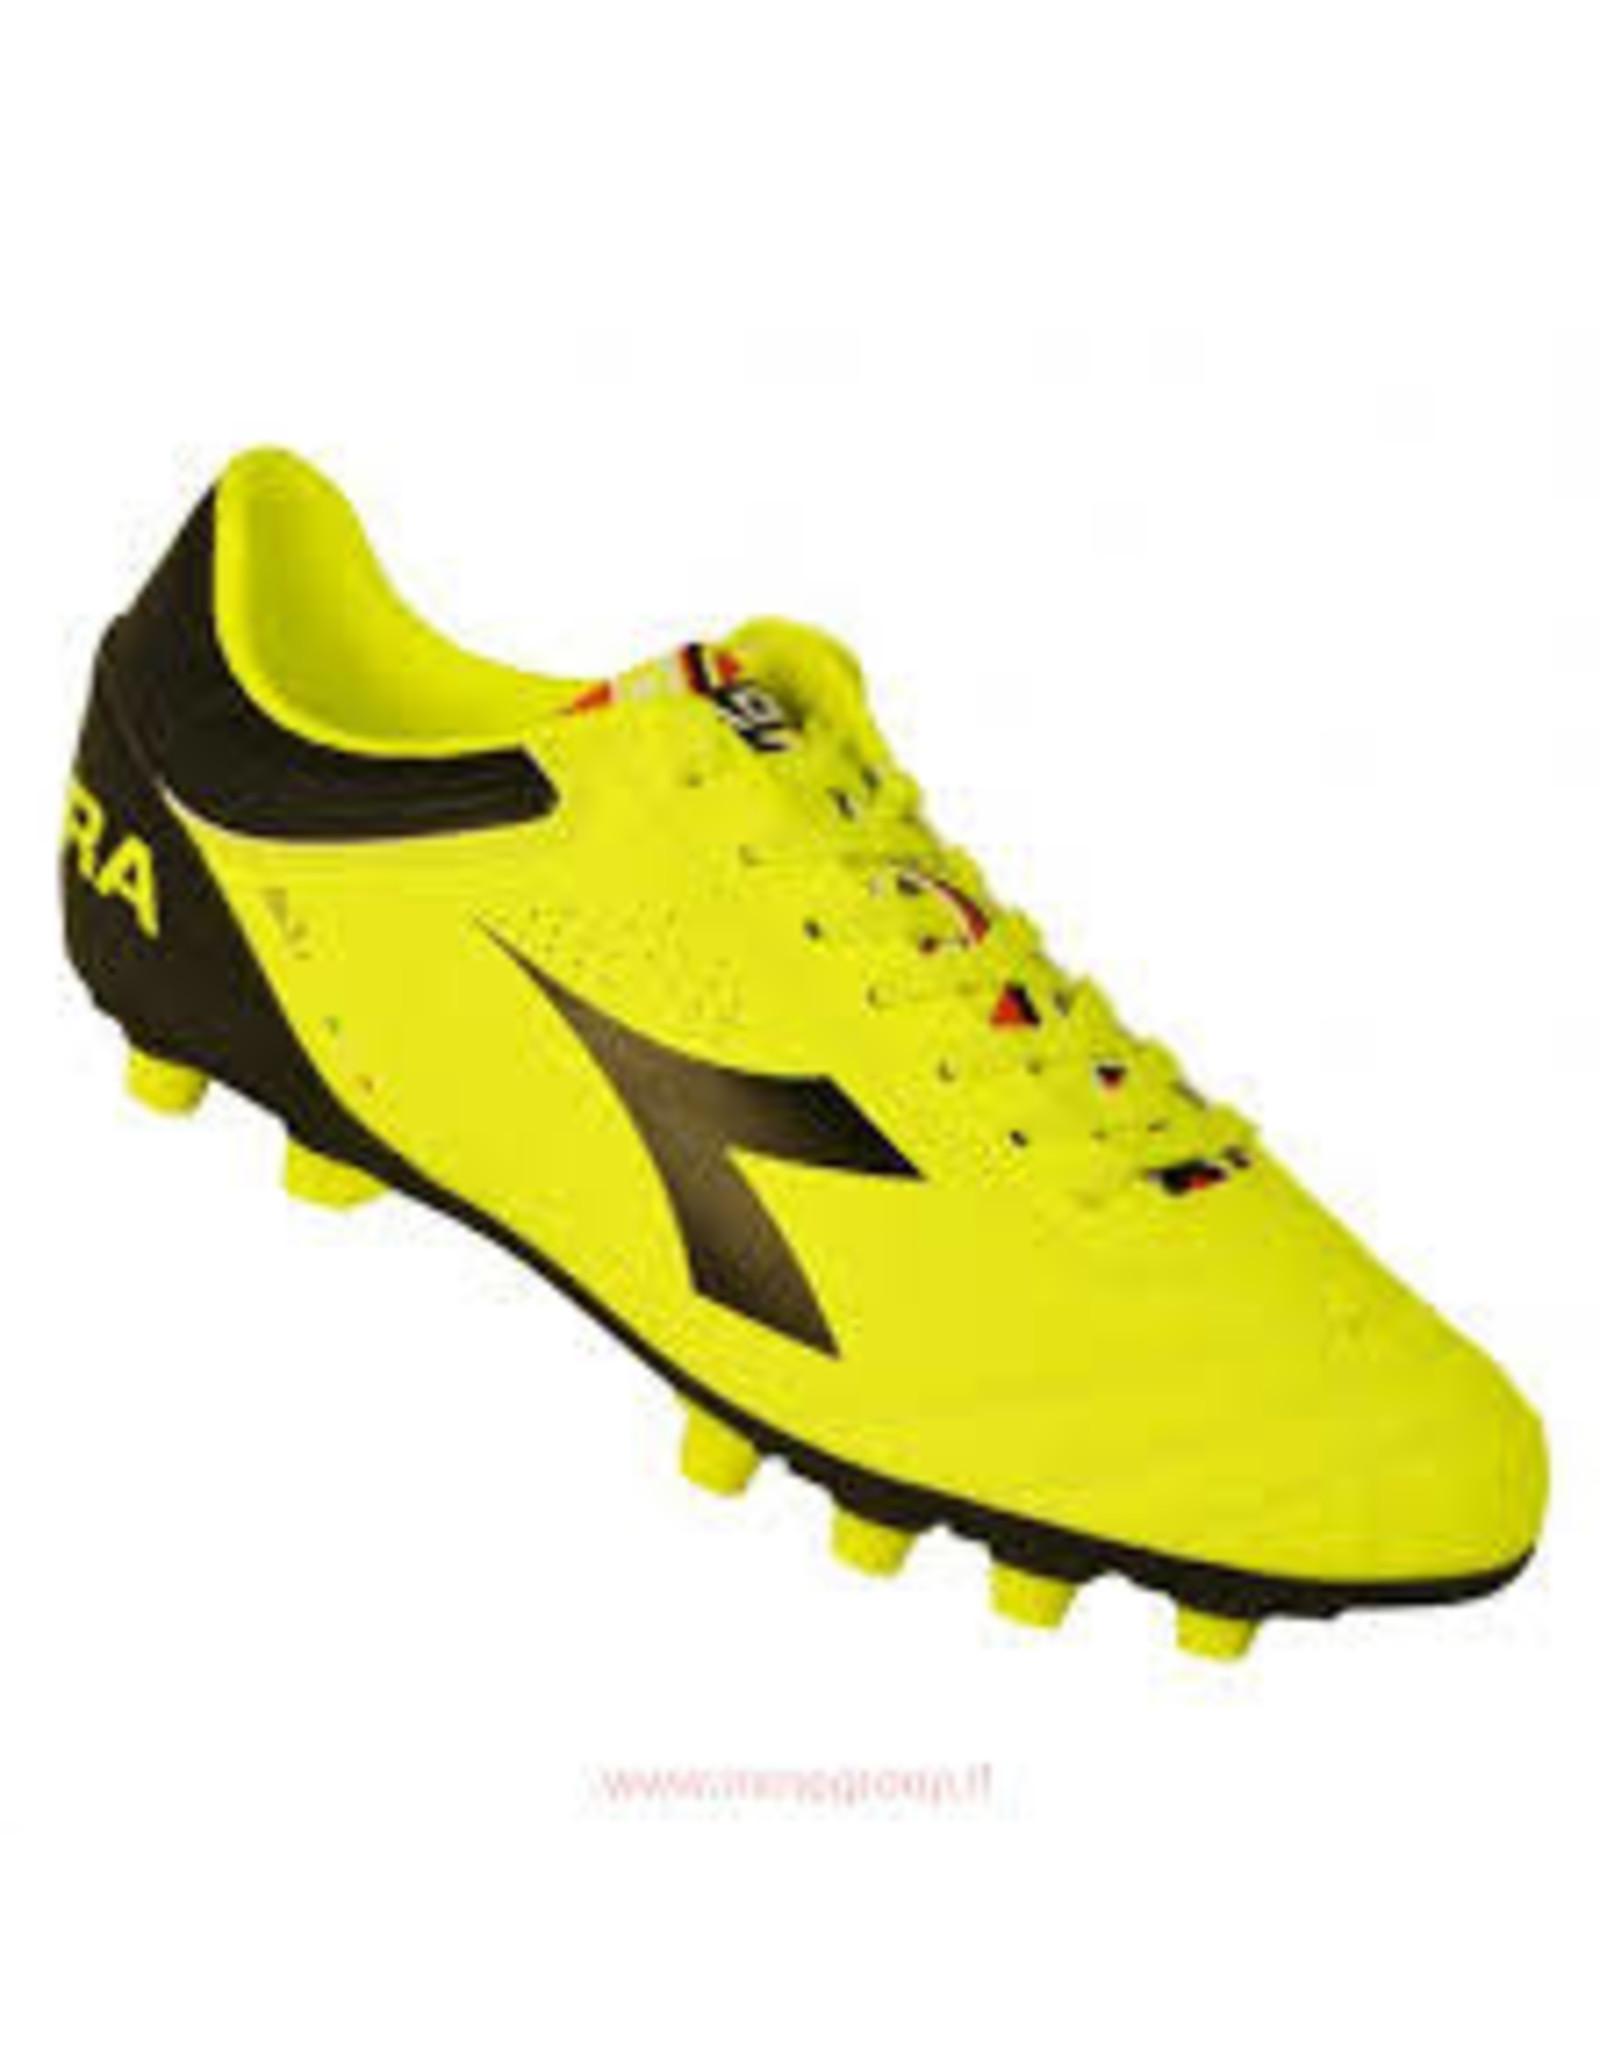 Diadora Diadora ITA3 MDPU FG Junior Football Boots (Fl Yellow/Black)